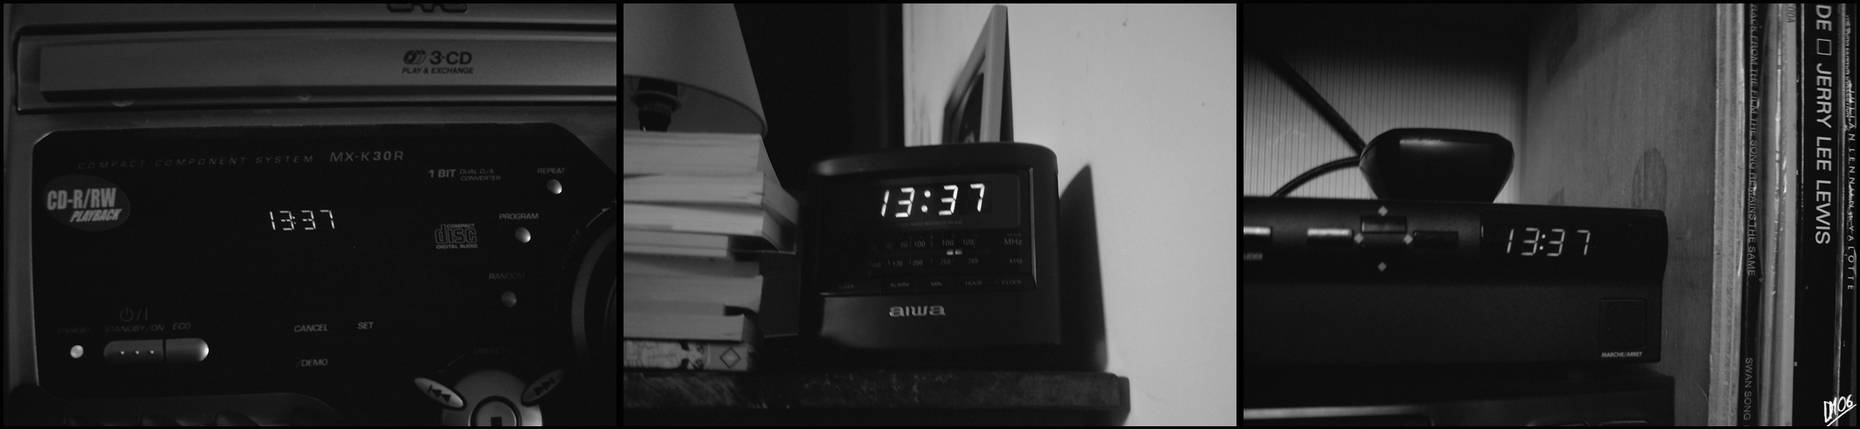 1337 hour